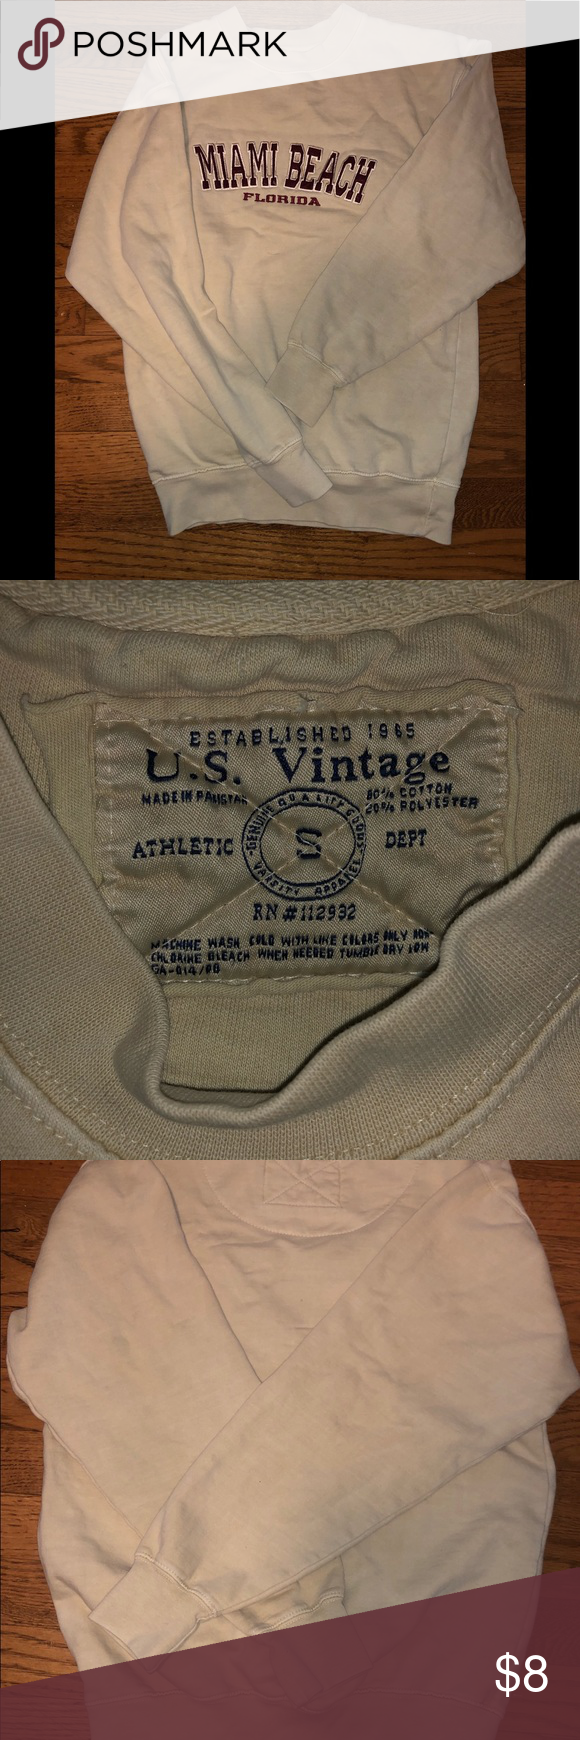 Us Vintage Sweatshirt Vintage Sweatshirt Vintage Florida Vintage